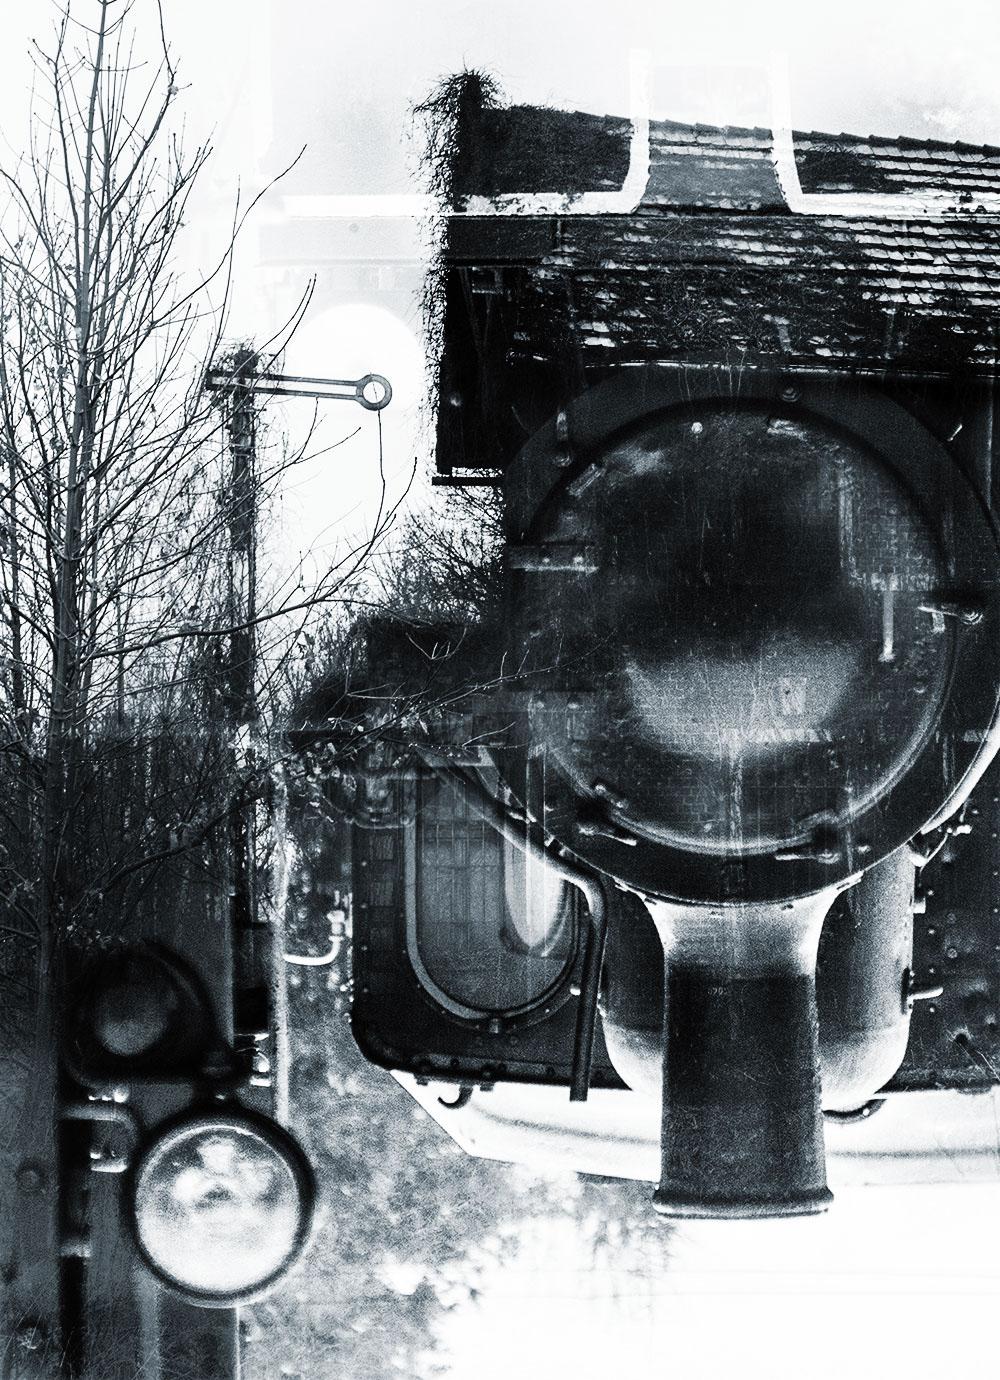 Fotografia kolej wąskotorowa colage